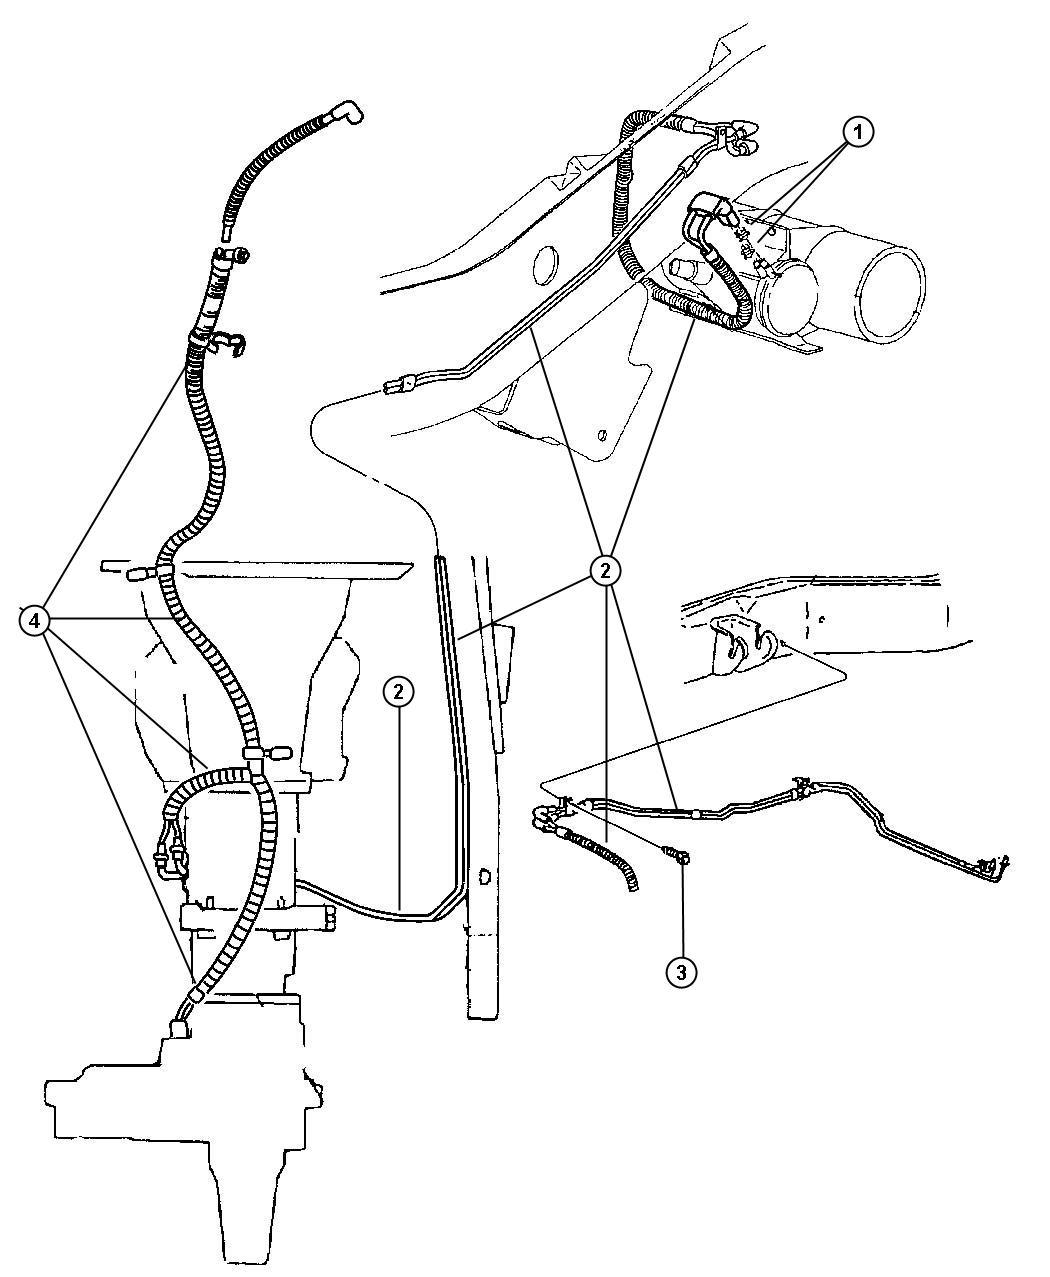 1997 Dodge Ram 3500 Parts Diagram, 1997, Free Engine Image